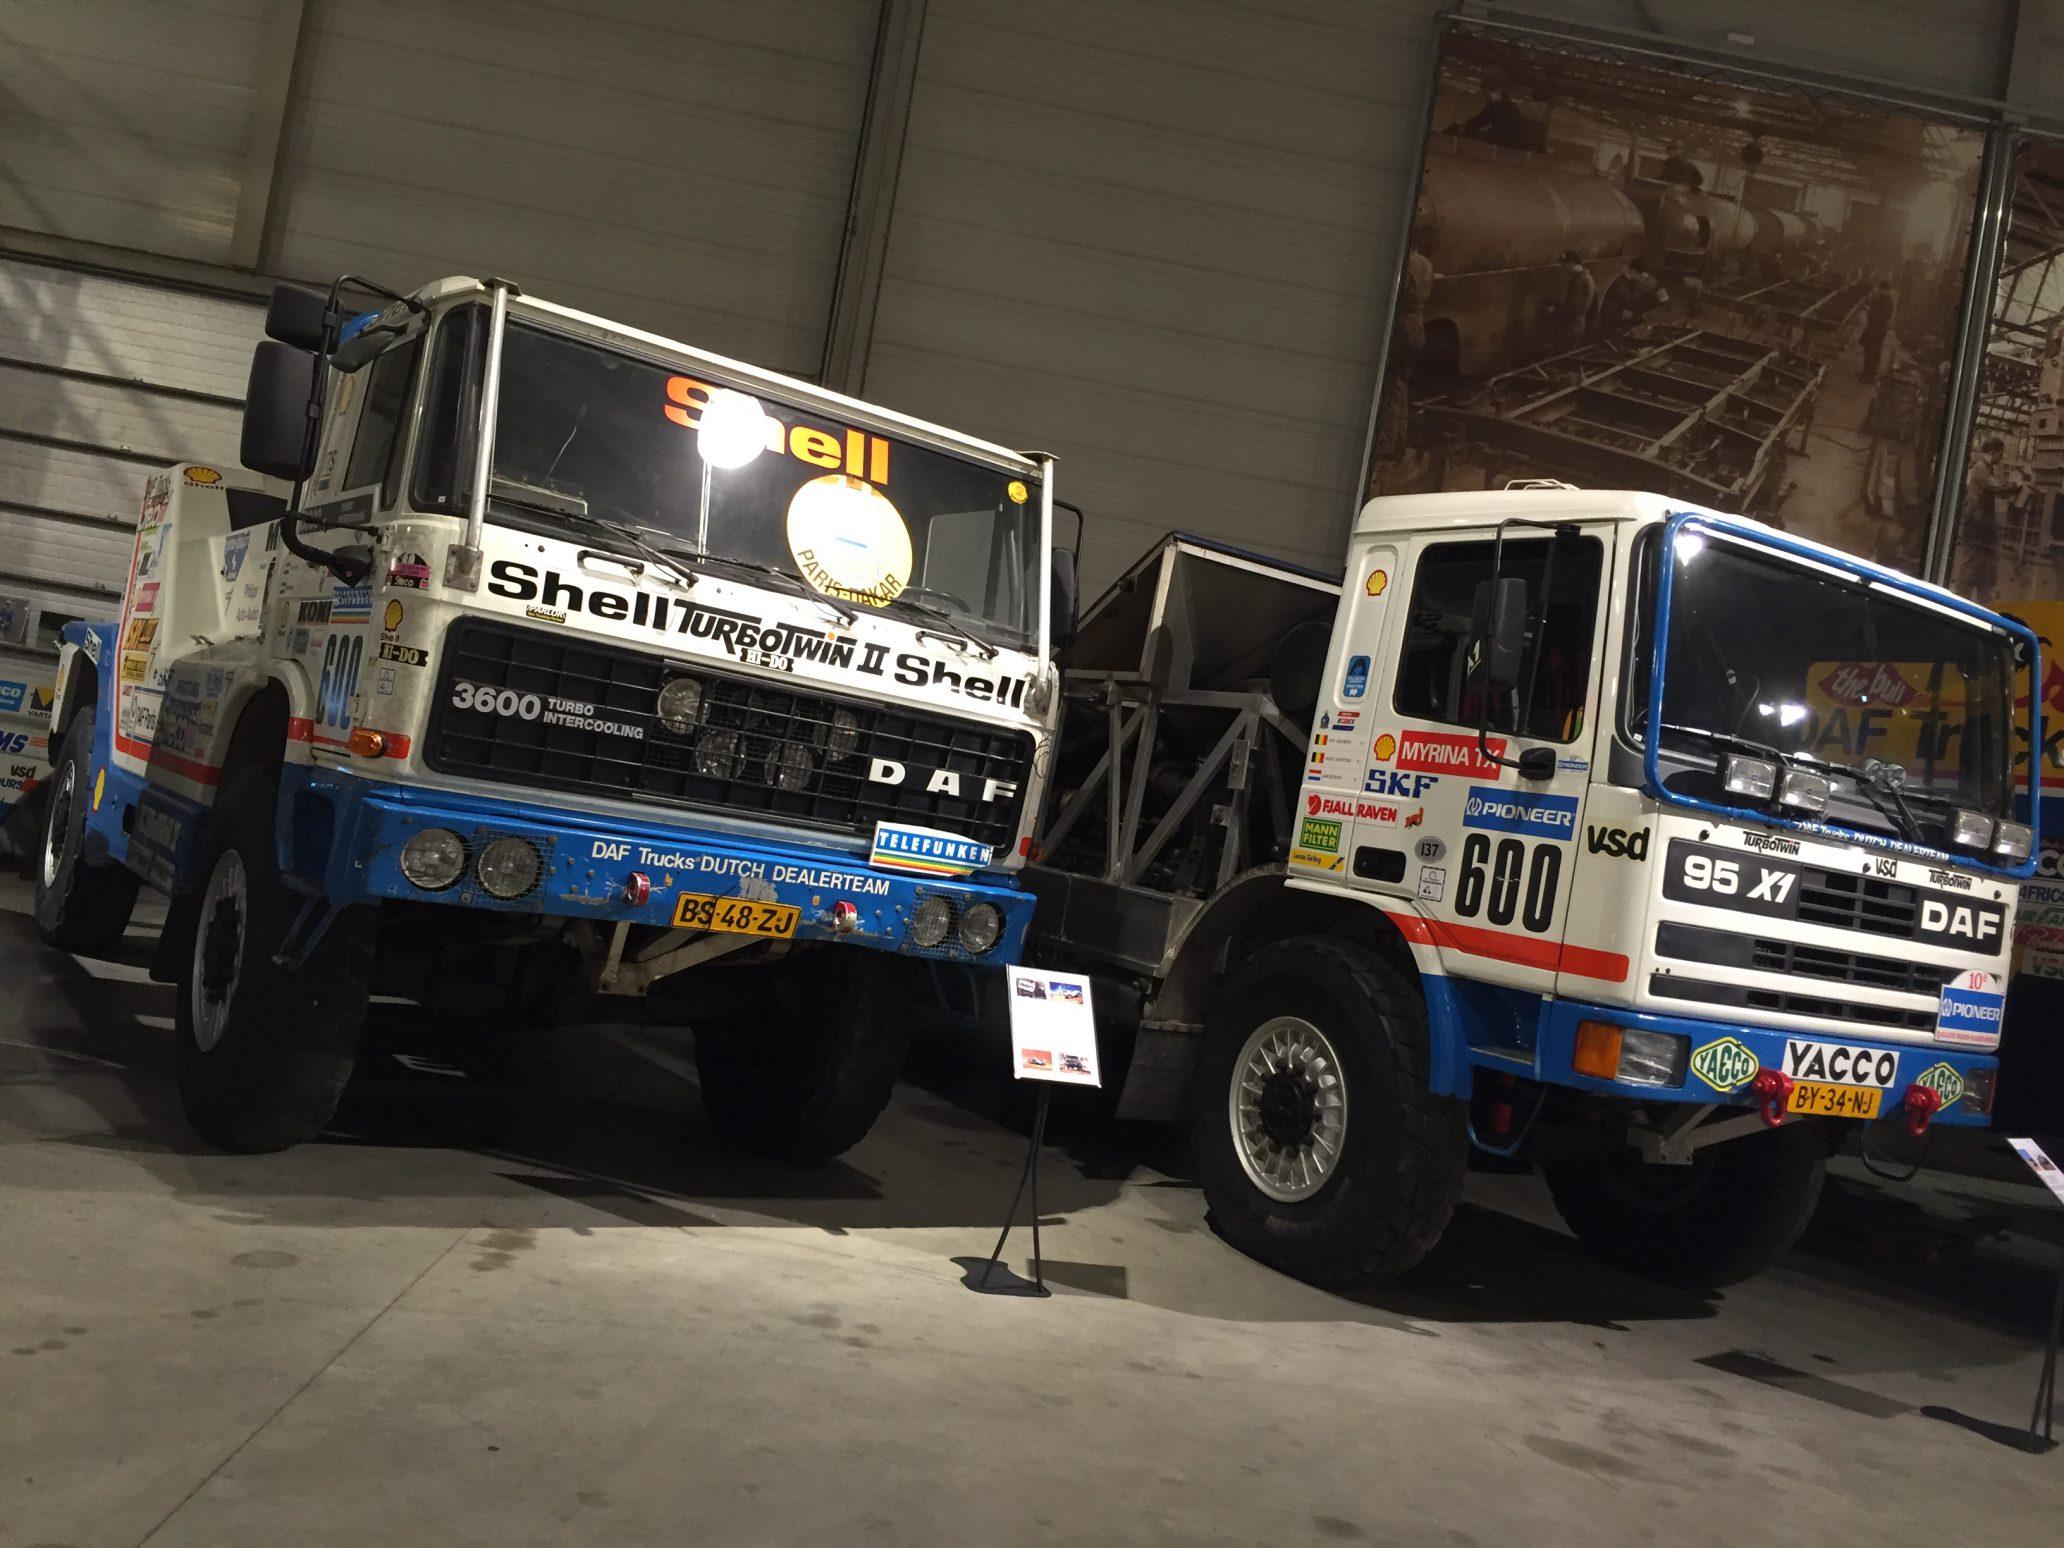 Daf 95 X1 en TurboTwin